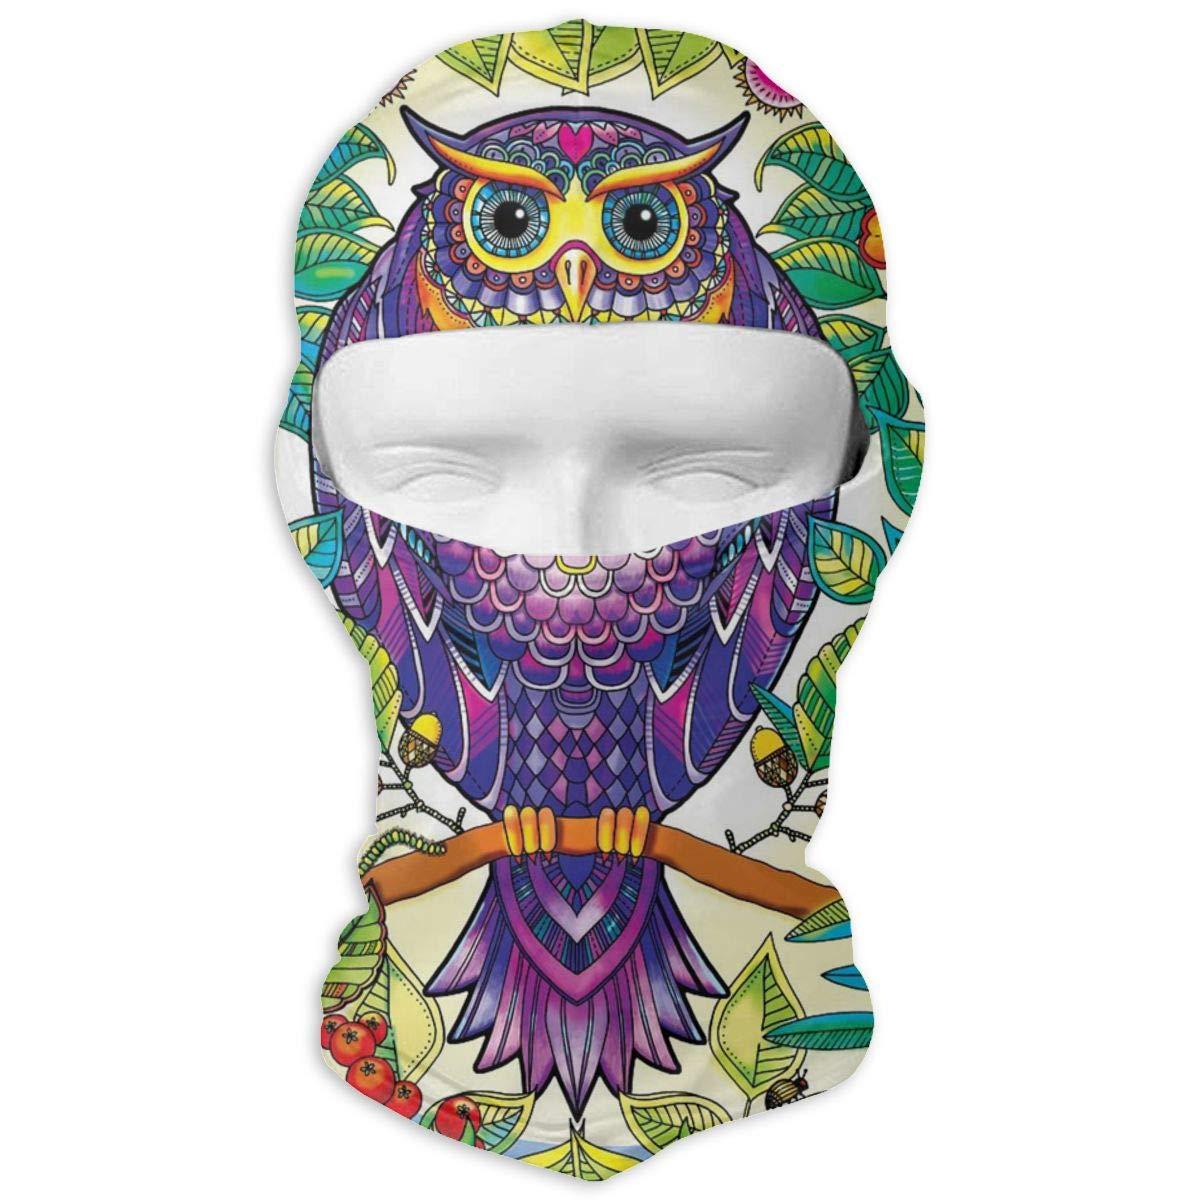 Wind-Resistant Face Mask LaoJi Colorful Owl Painting Winter Ski Mask Balaclava Hood